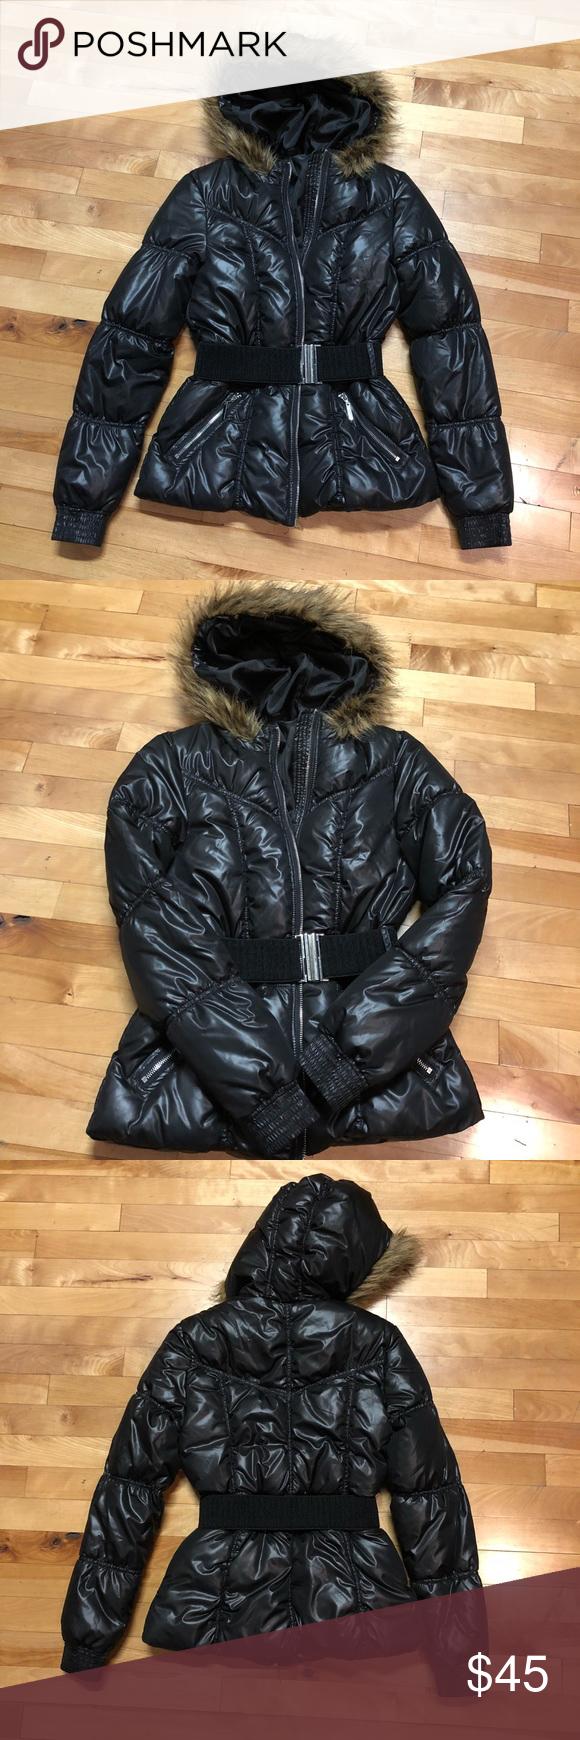 H & M Fur Black Puffer Down Jacket 6 Black puffer